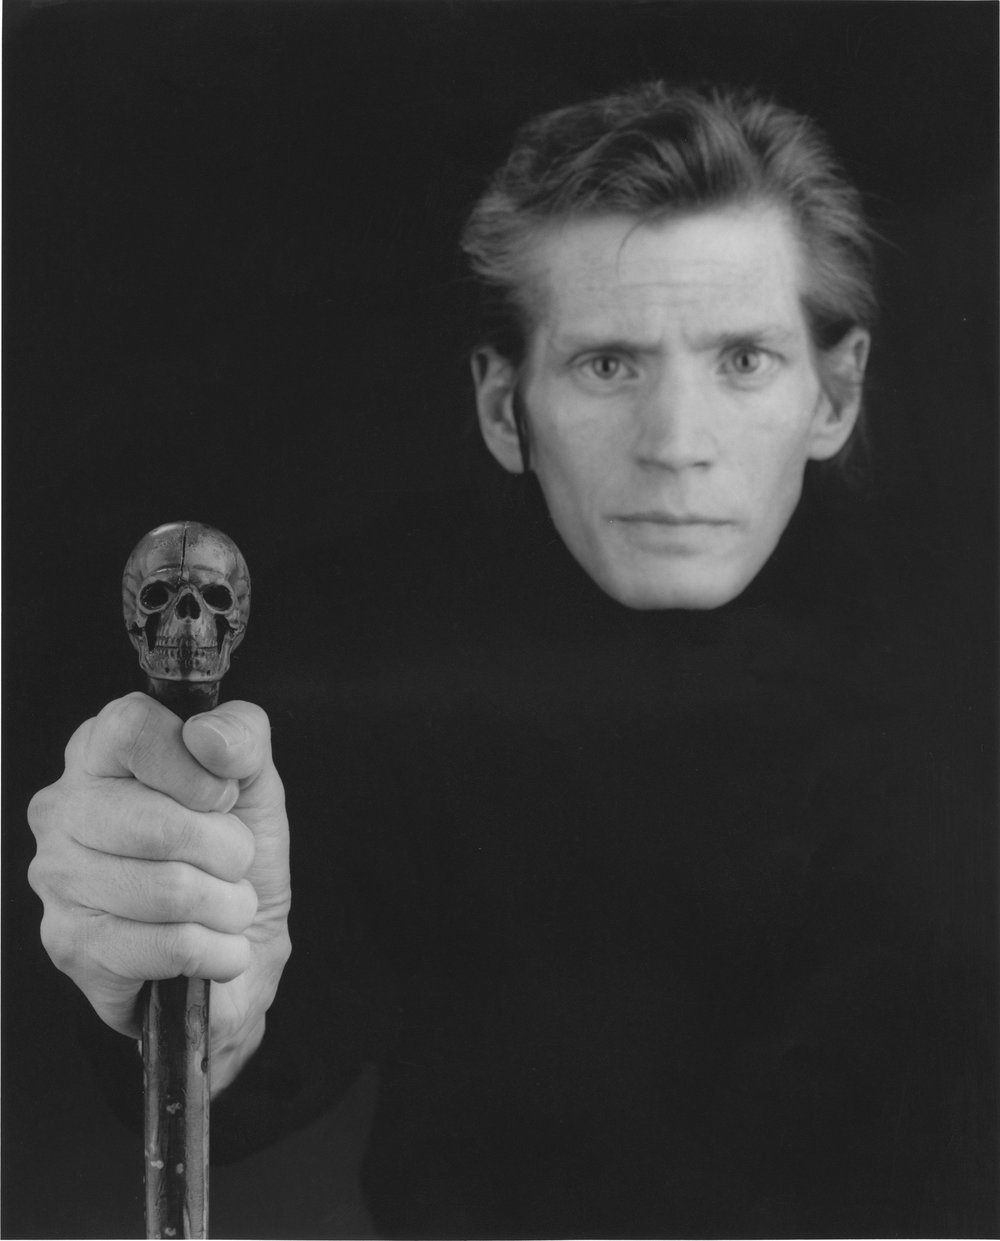 Self-portrait, 1988